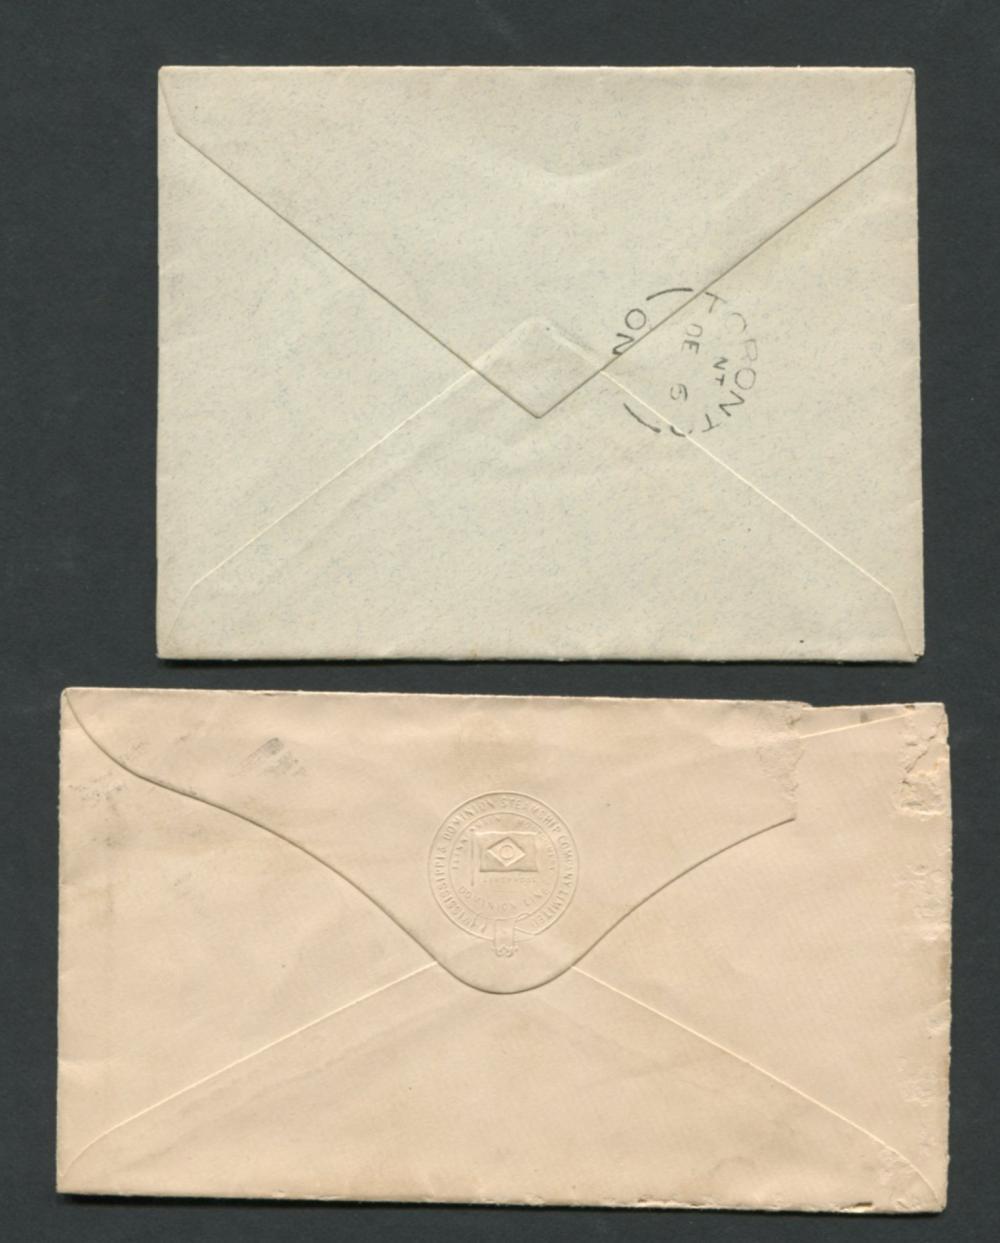 Canada Victoria Stamp Covers 16